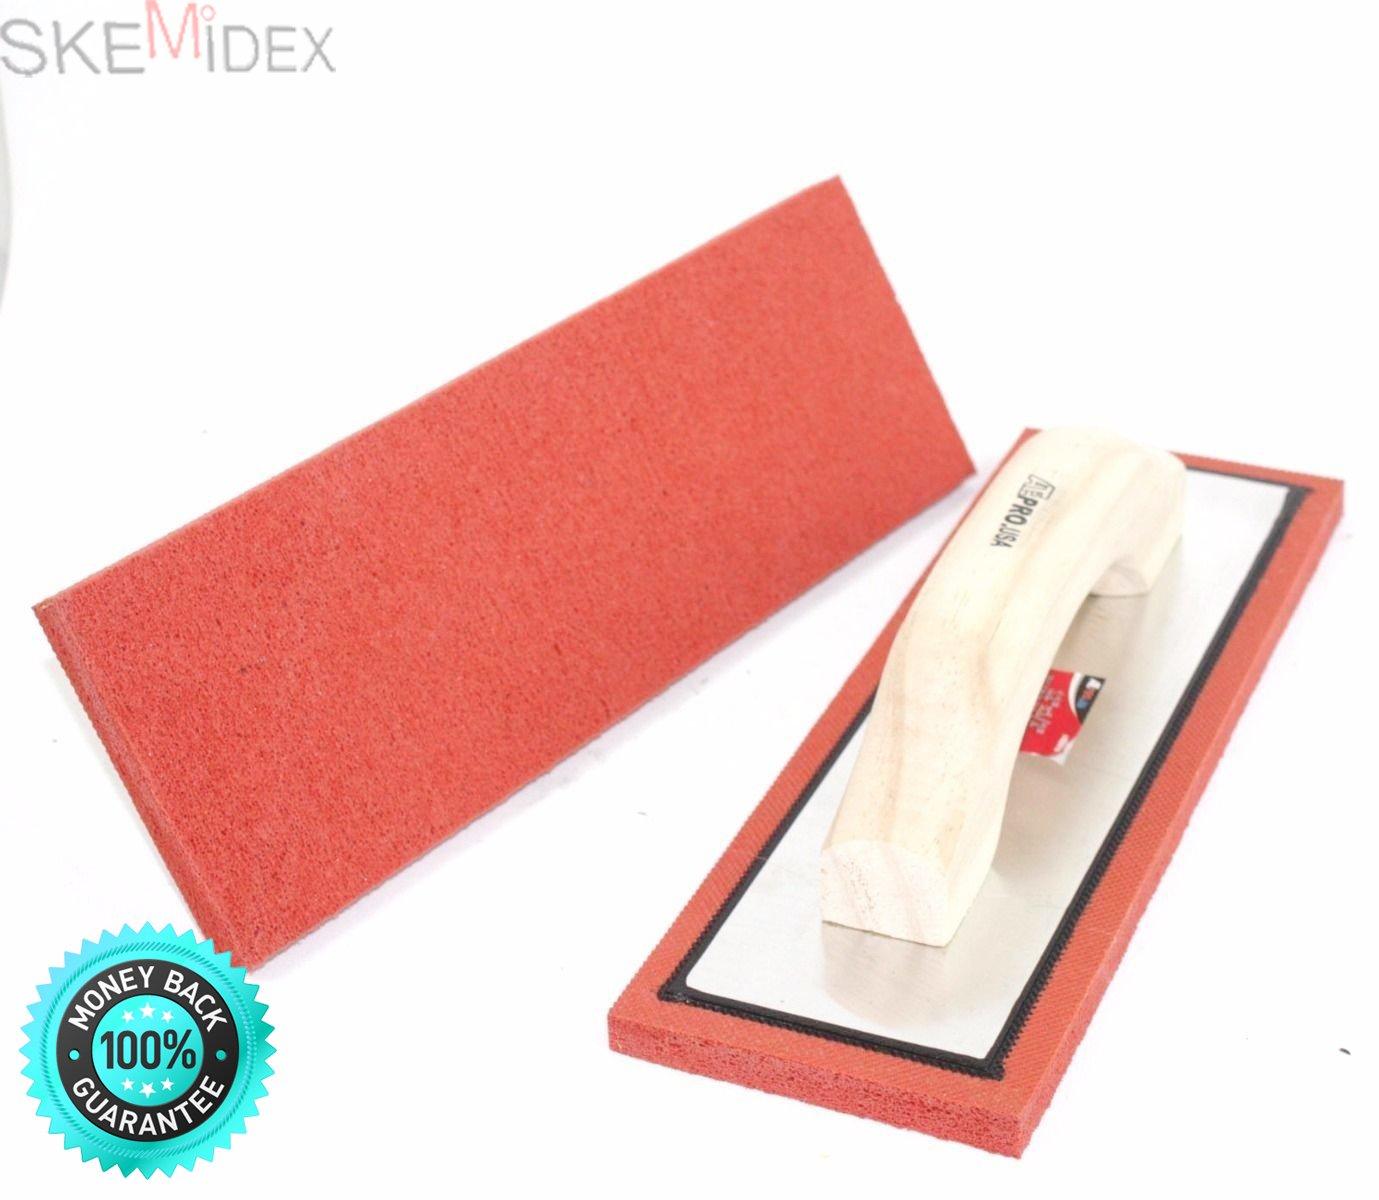 SKEMiDEX---Lot Two 12'' x 4'' Rubber Sponge Grout Float Tile Hand Trowel Tools w/Wood Handle. Non-stick gum rubber ensures smooth application Thick aluminum backing plate resists bending